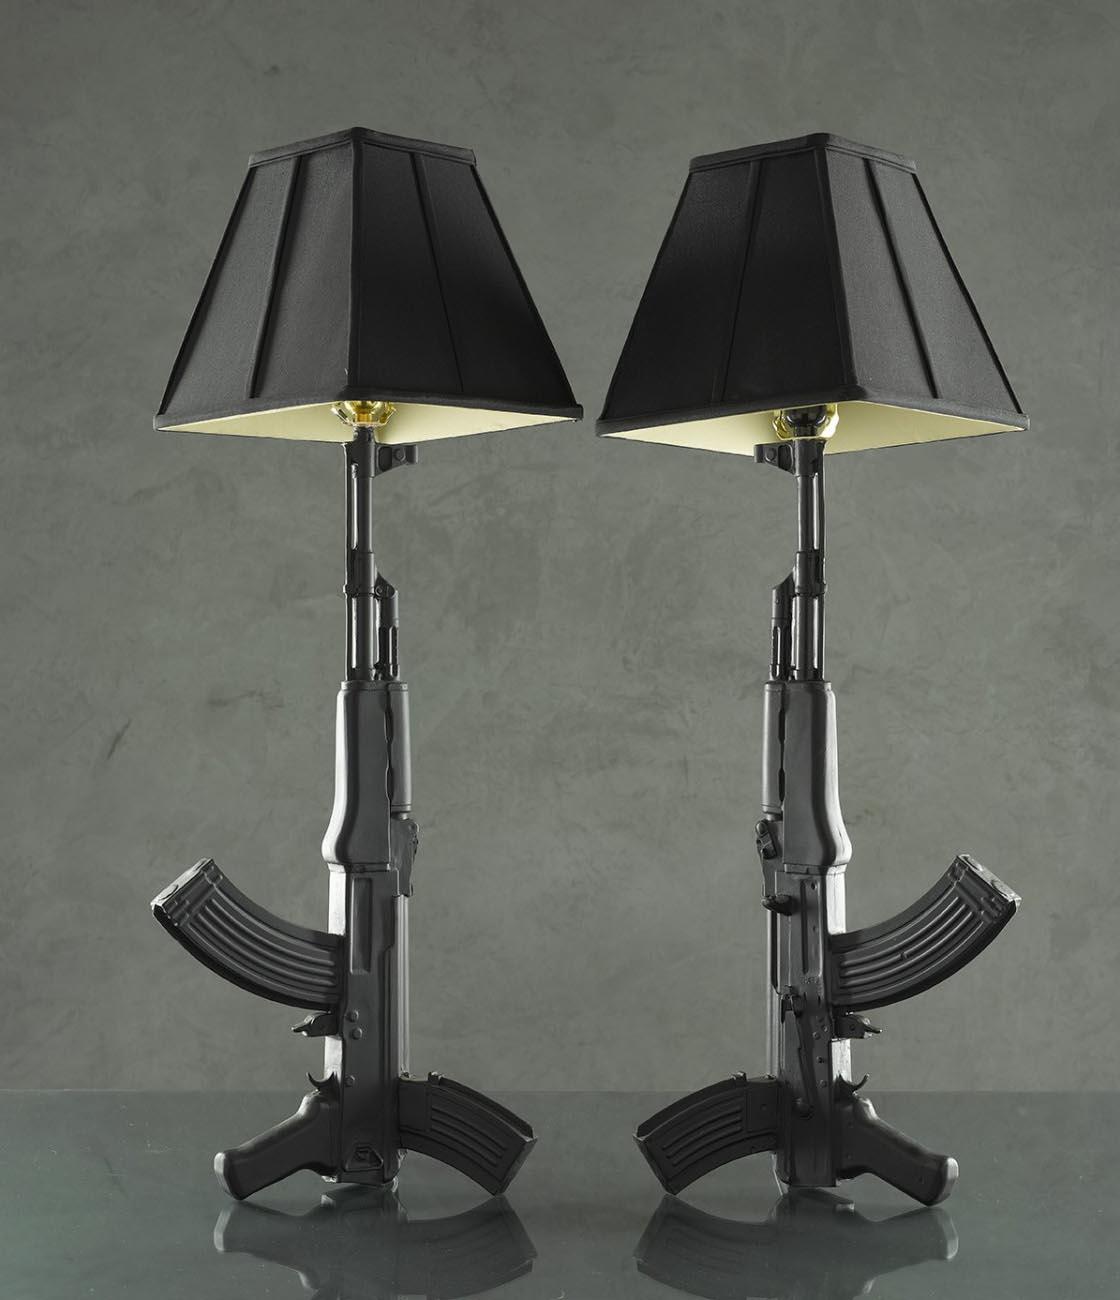 Handmade ak 47 styled table lamp gadgetsin - Handmade table lamp ...